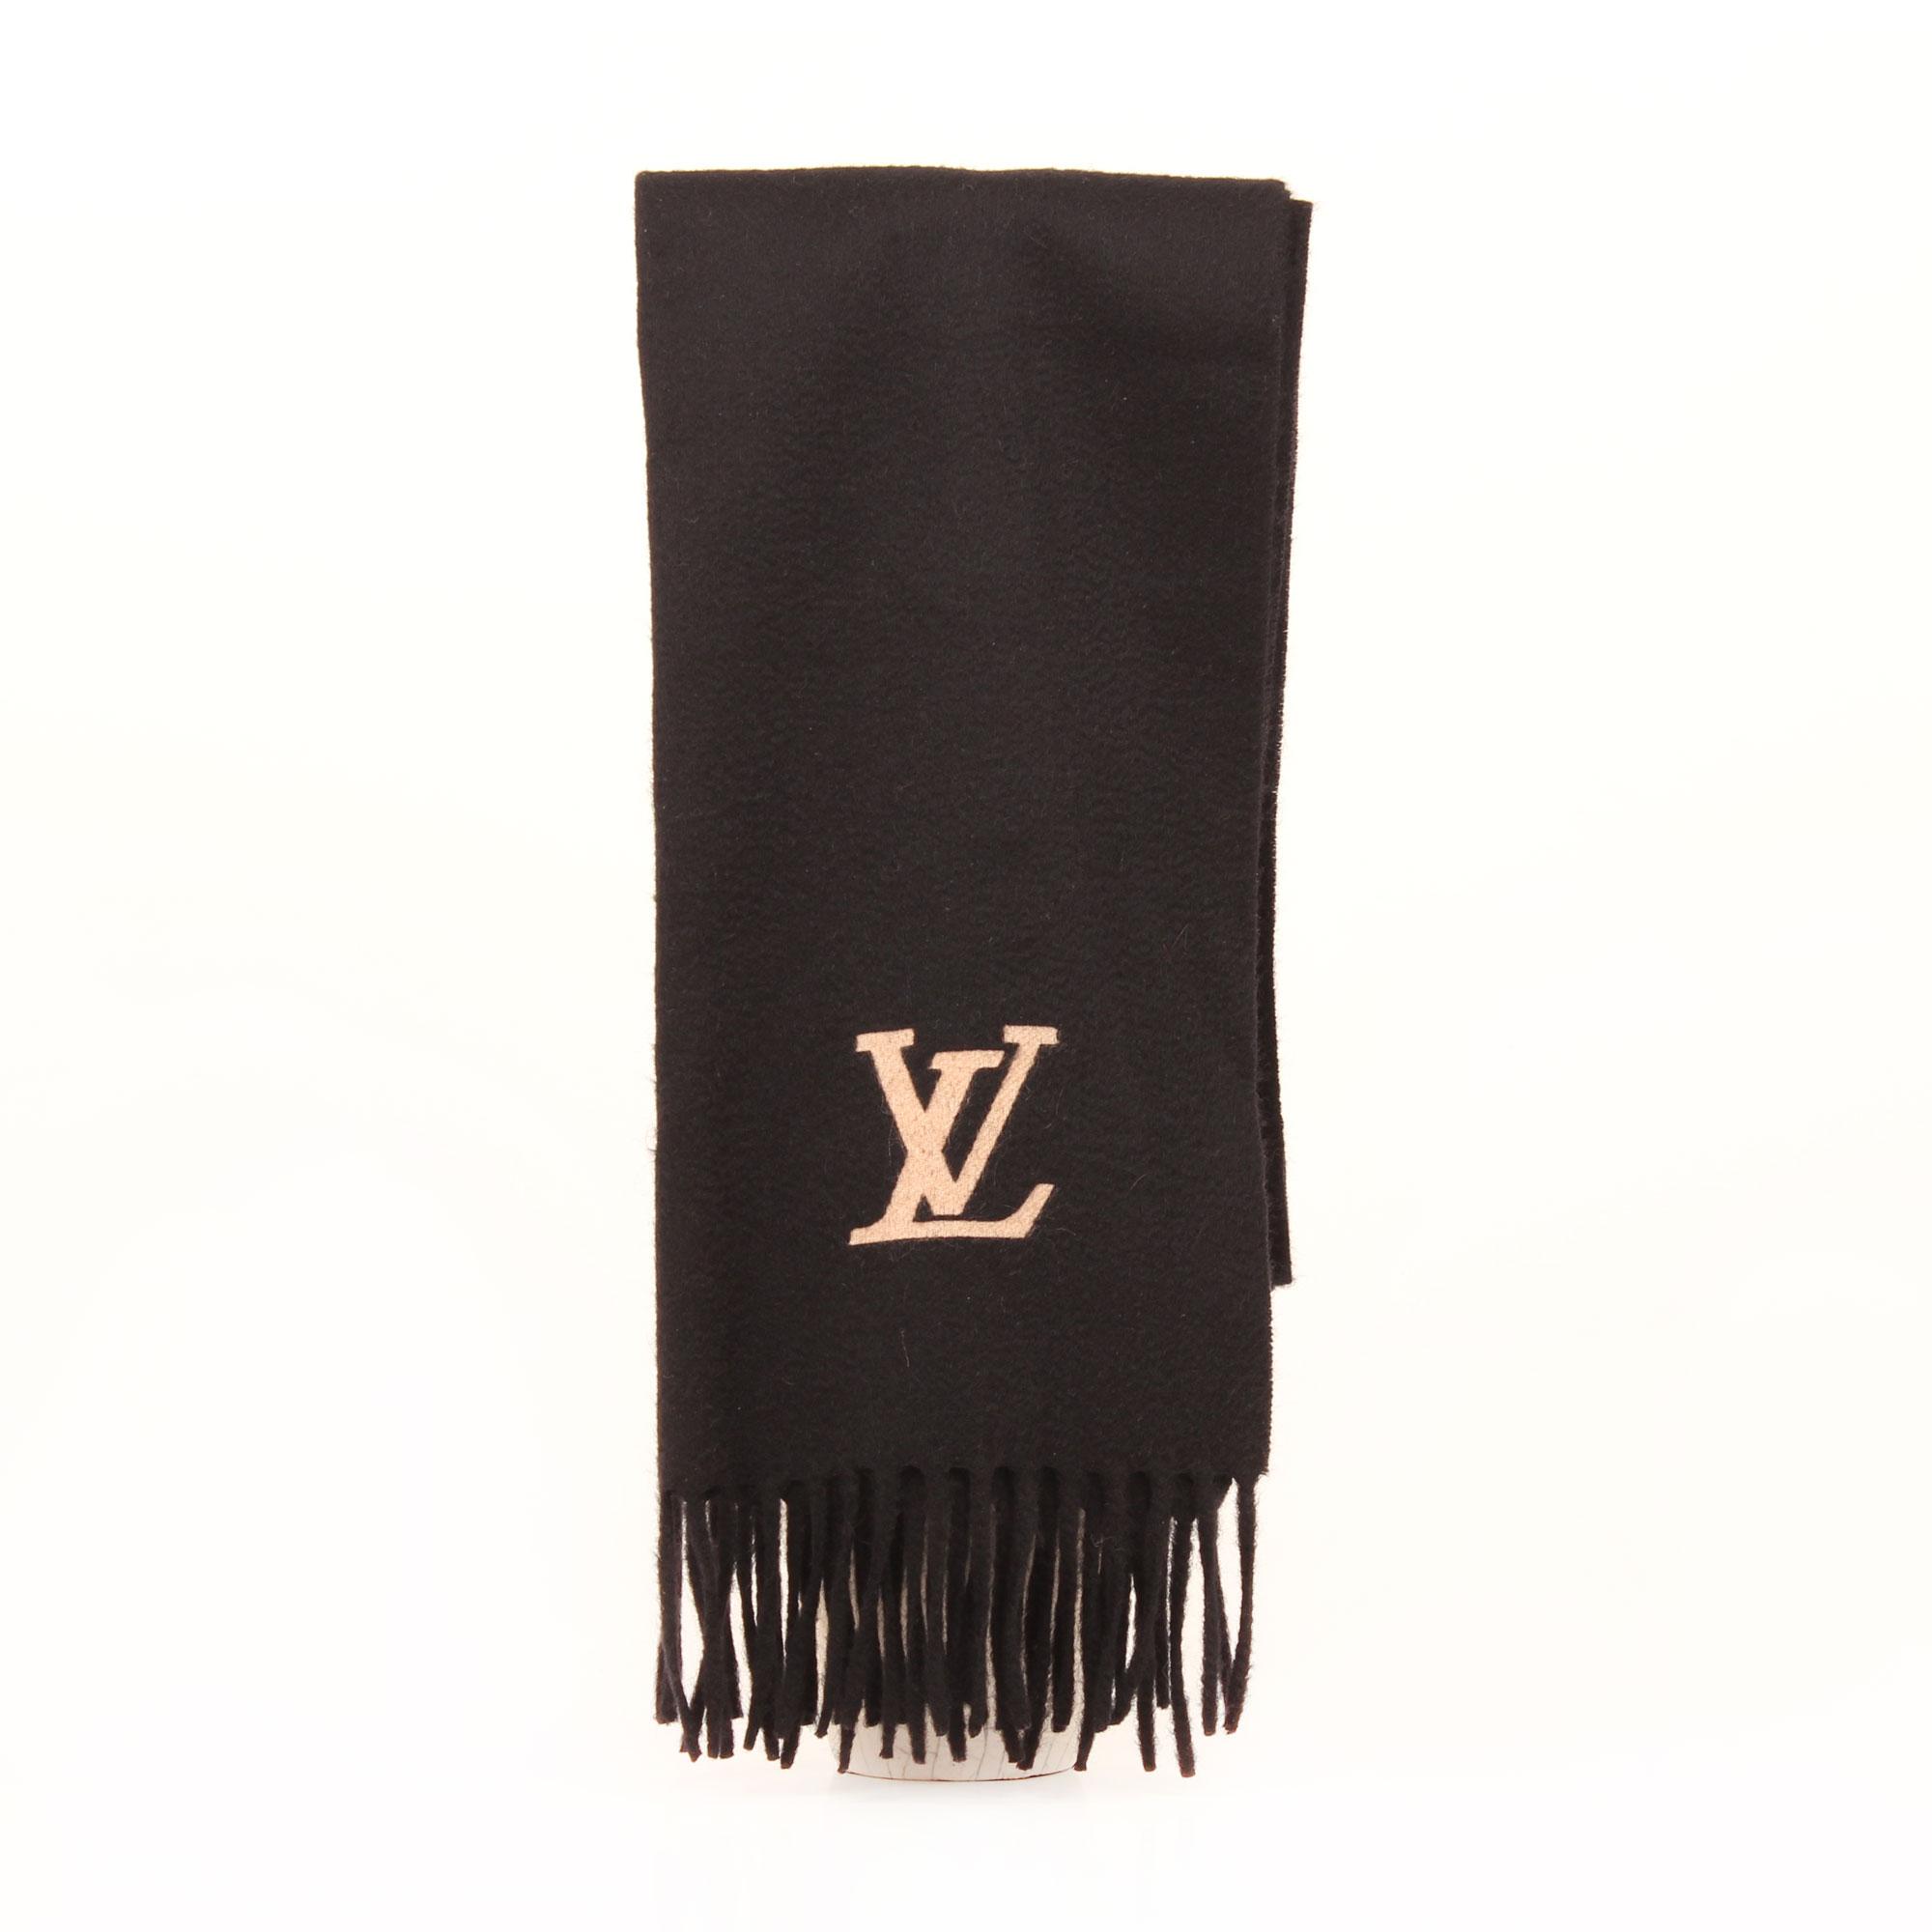 bufanda-louis-vuitton-jehlam-cashmere-negro-general